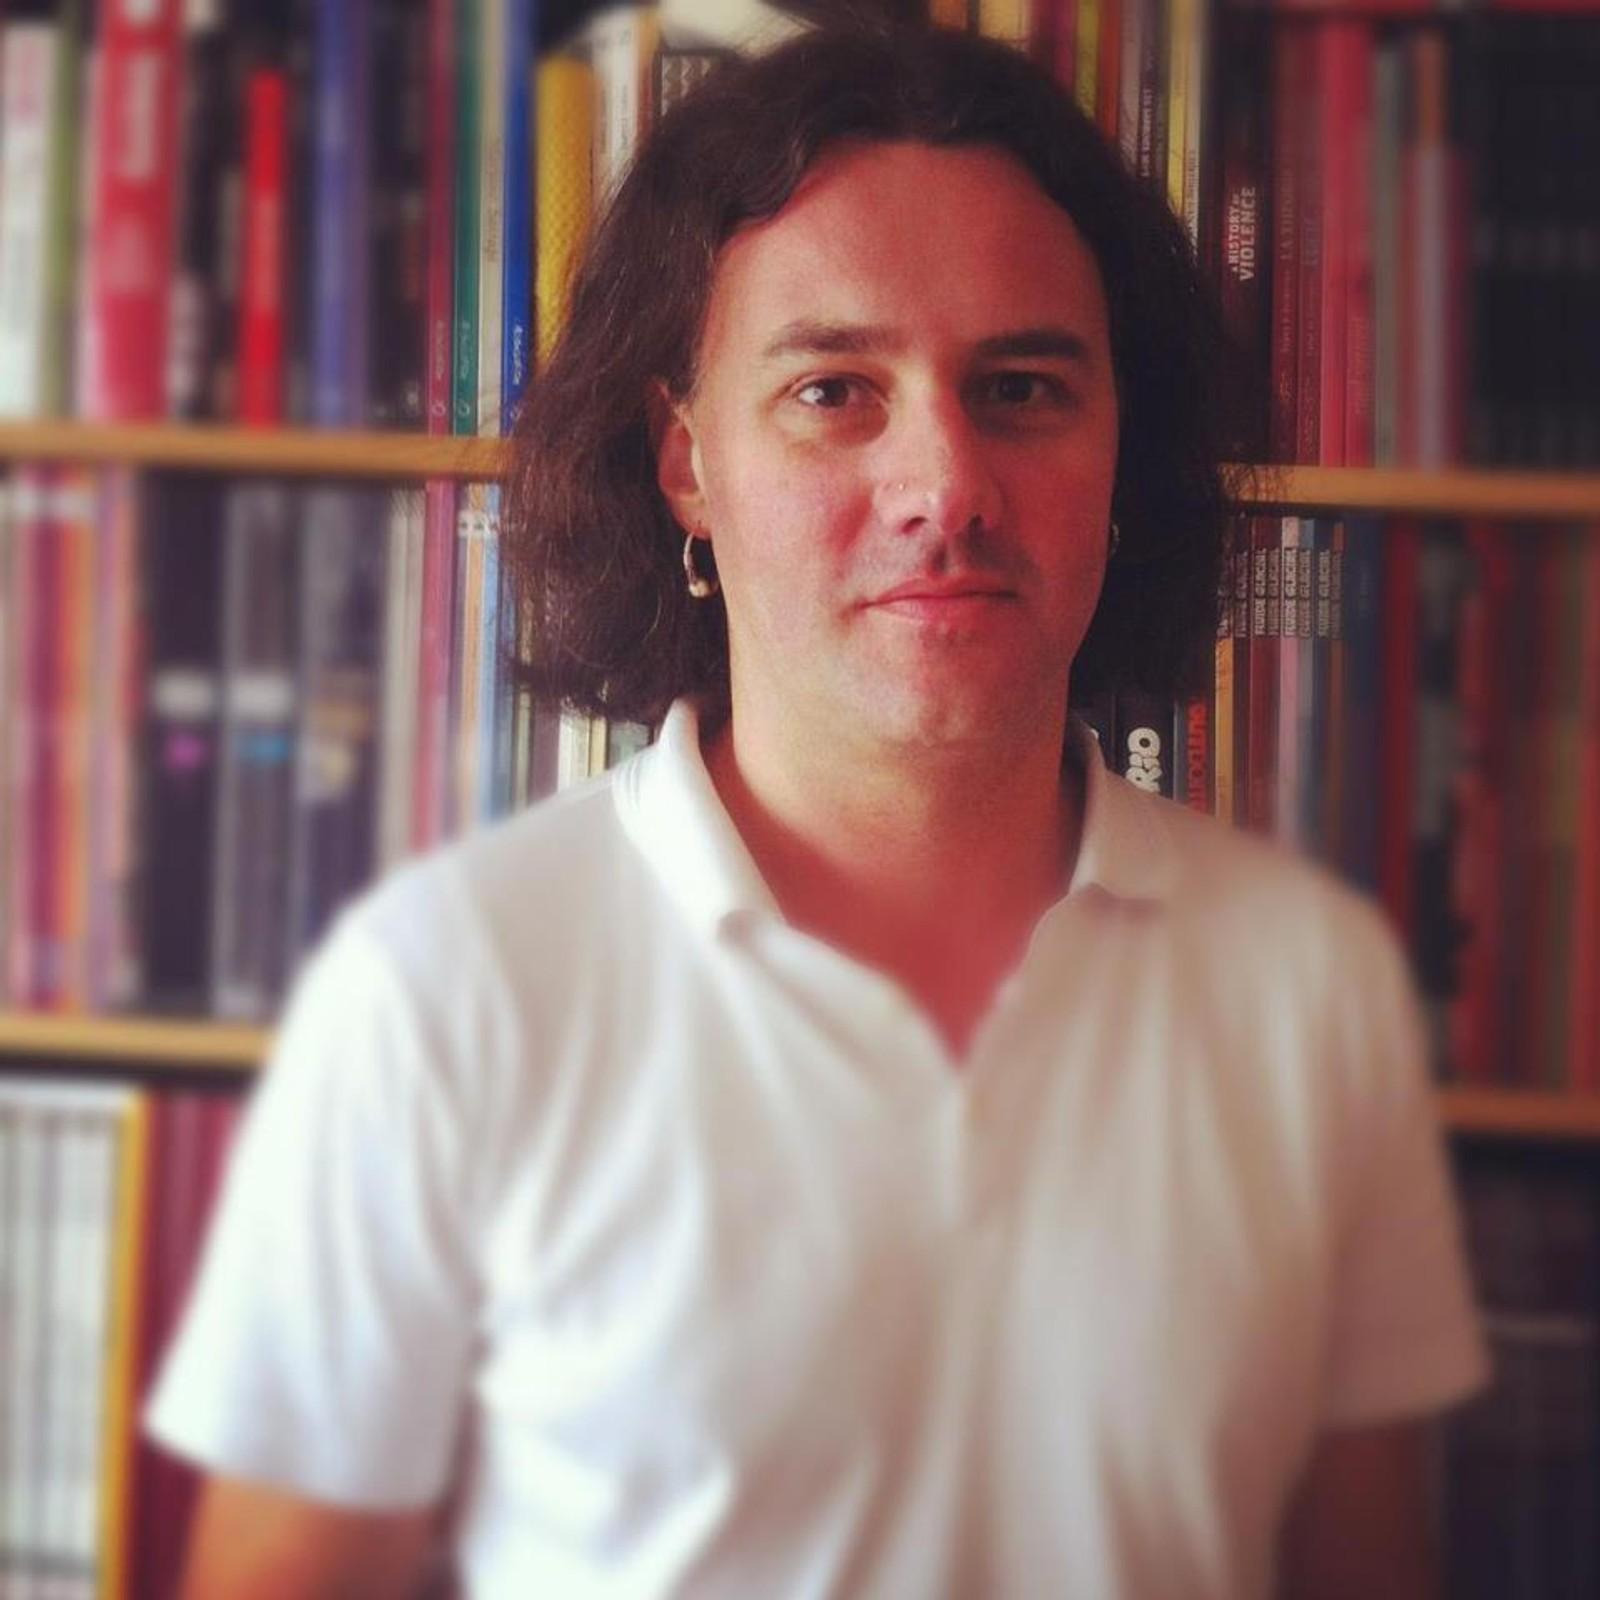 DREPT: Franske Guliame Decherf (43) var journalist for magasinet Inrockuptibles. Decherf døde på Bataclan konserthus.